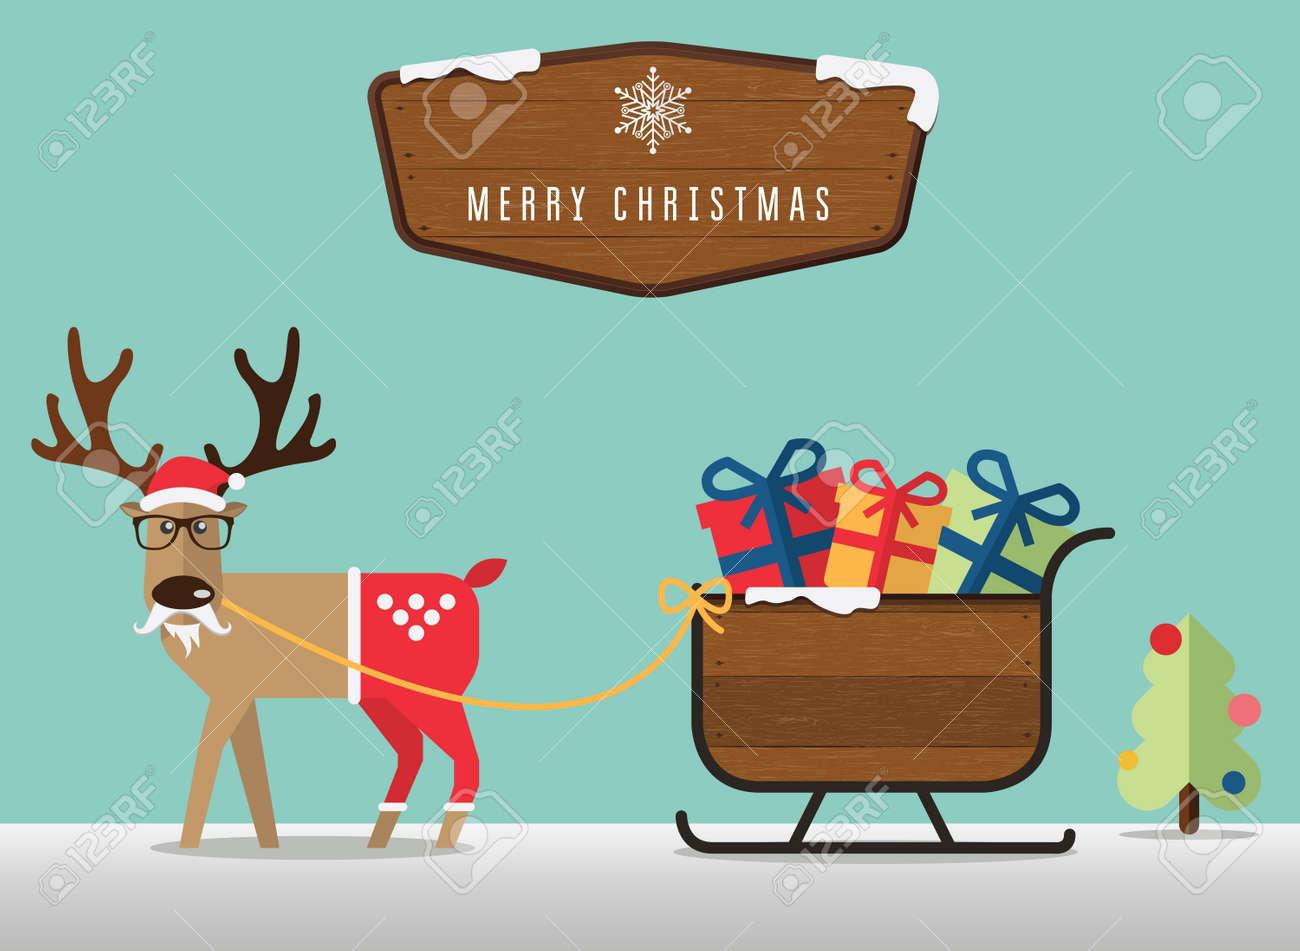 Merry Christmas scene with reindeer , santa?s sleigh and wood badge - 34625415